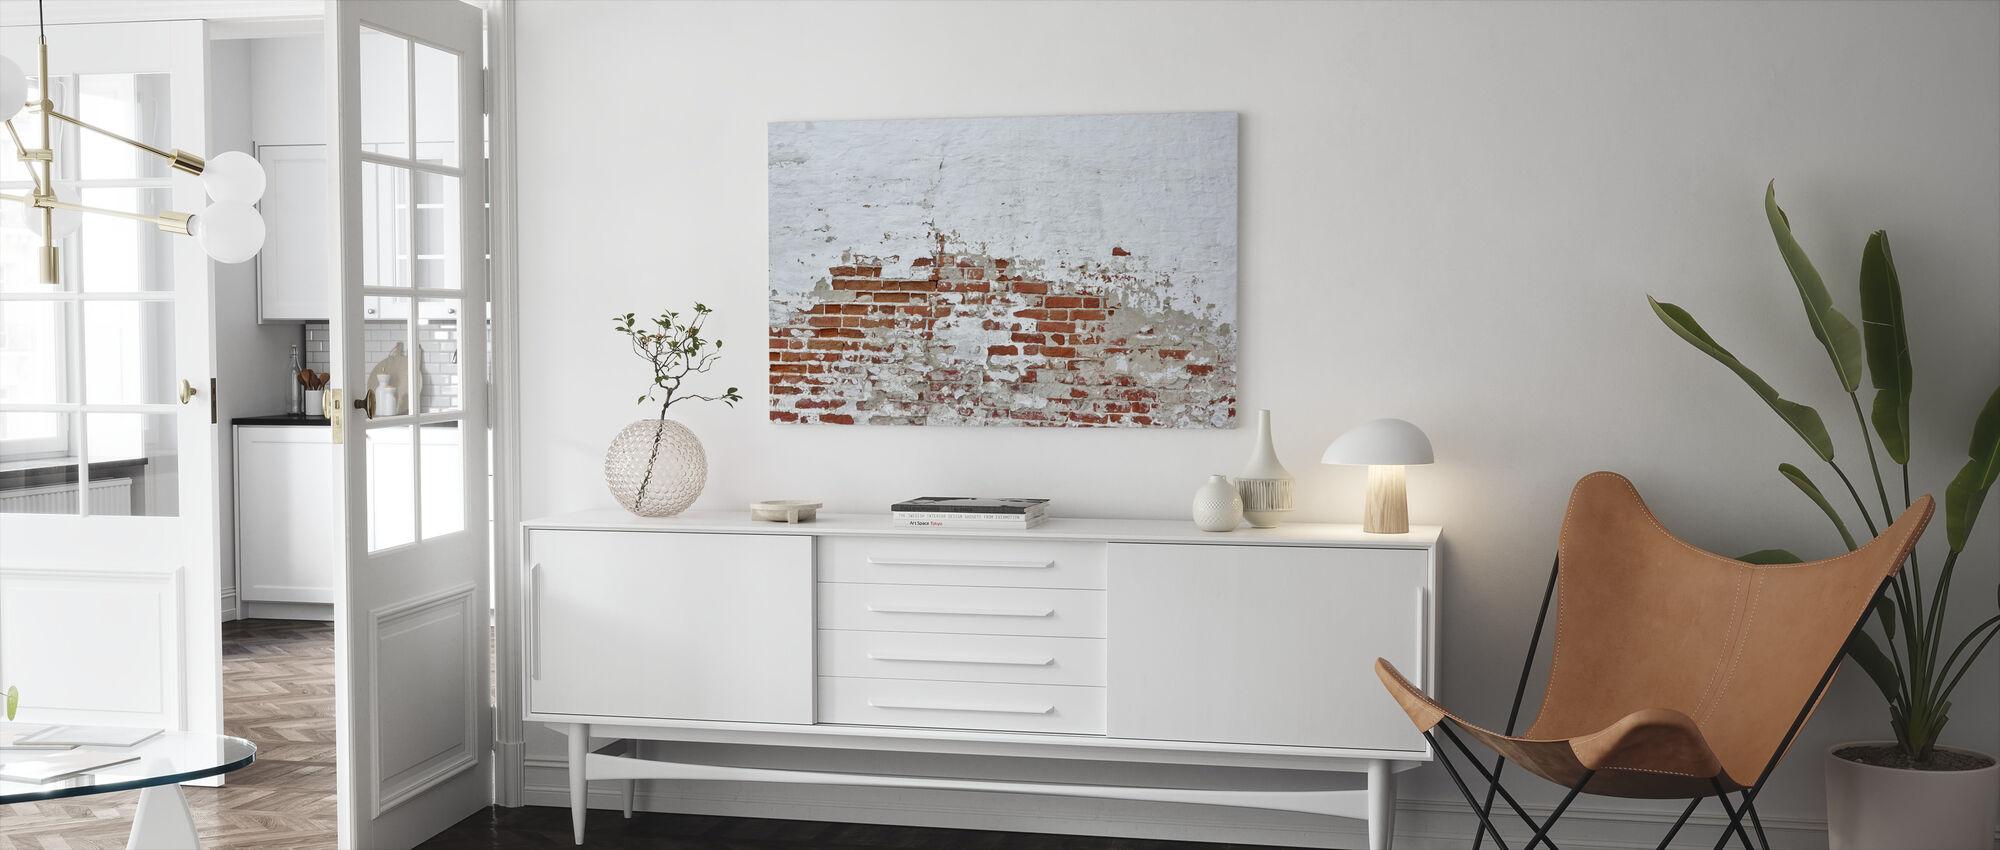 Rode bakstenen muur met besprenkelde witte pleister - Canvas print - Woonkamer